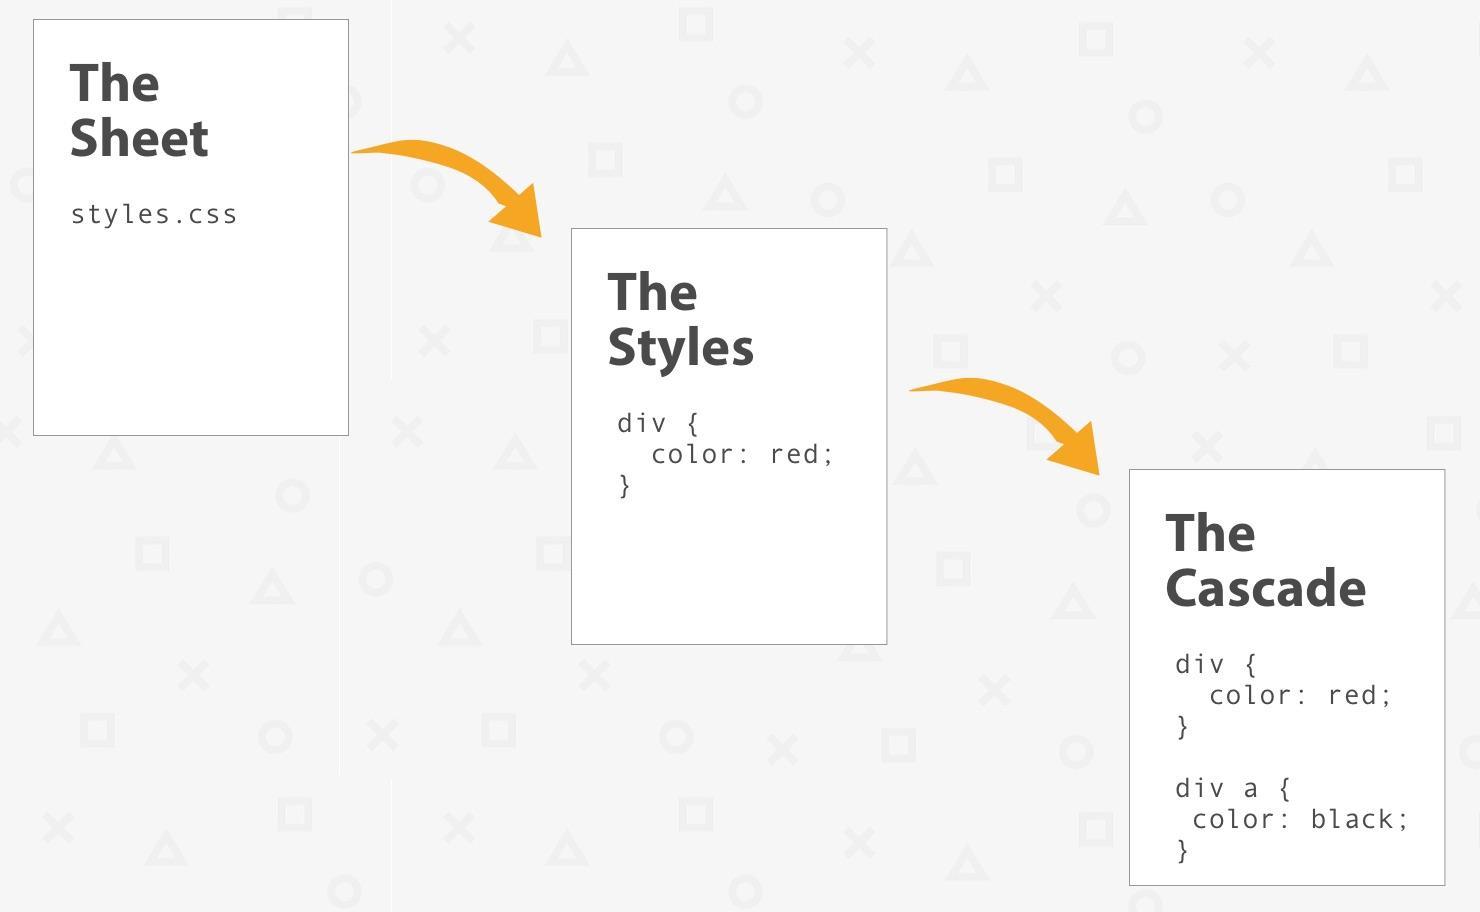 CSS Basics: The Second